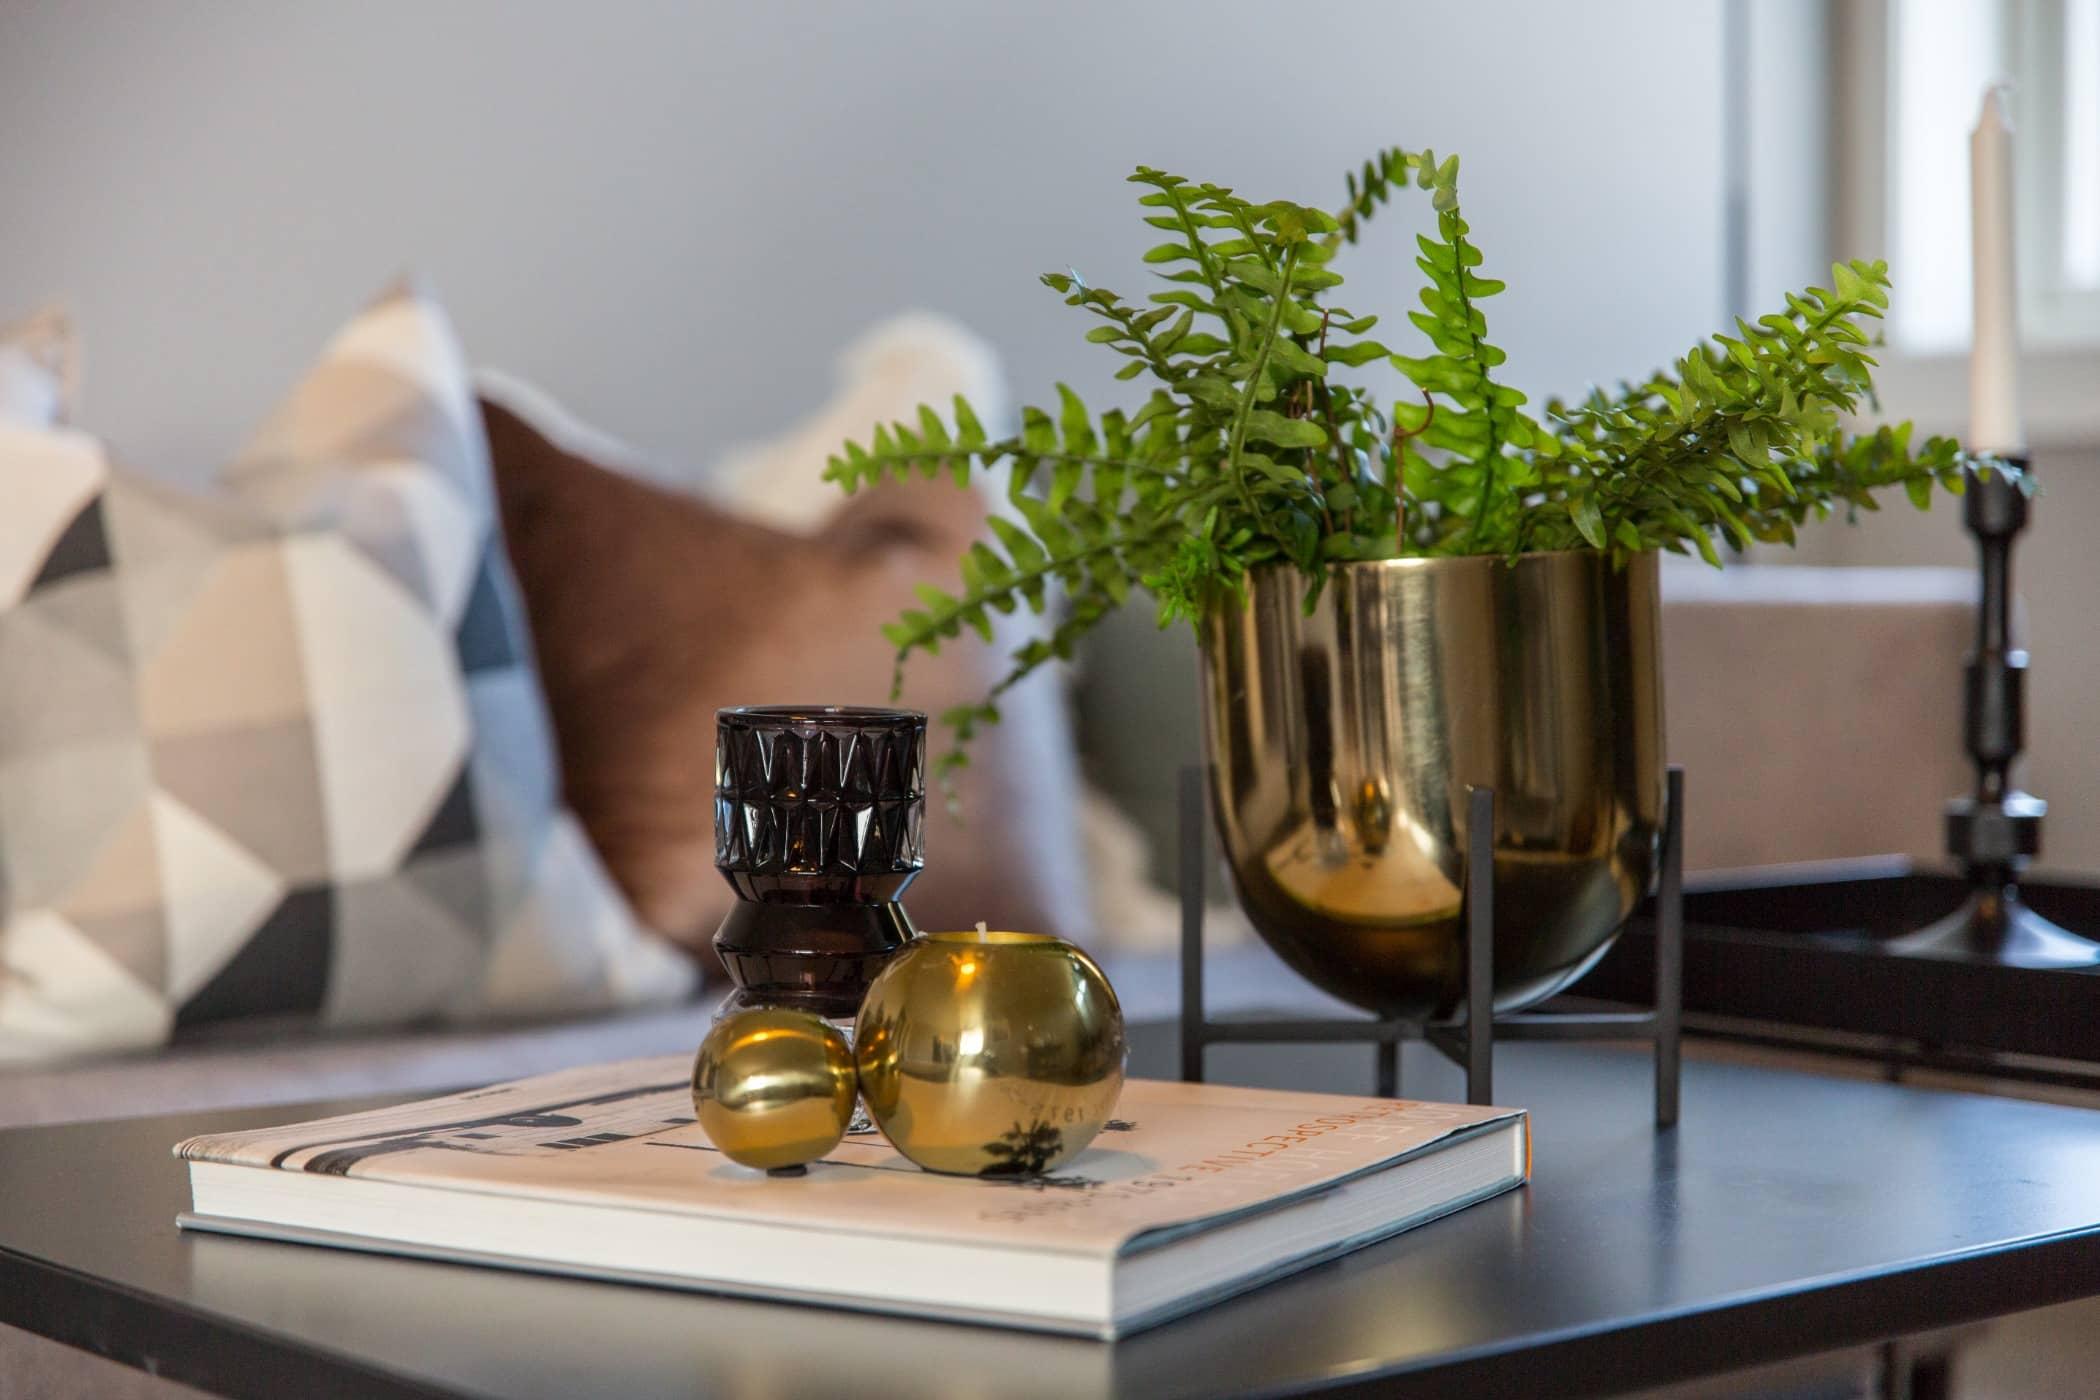 Interior design, Houseplant, Room, Table